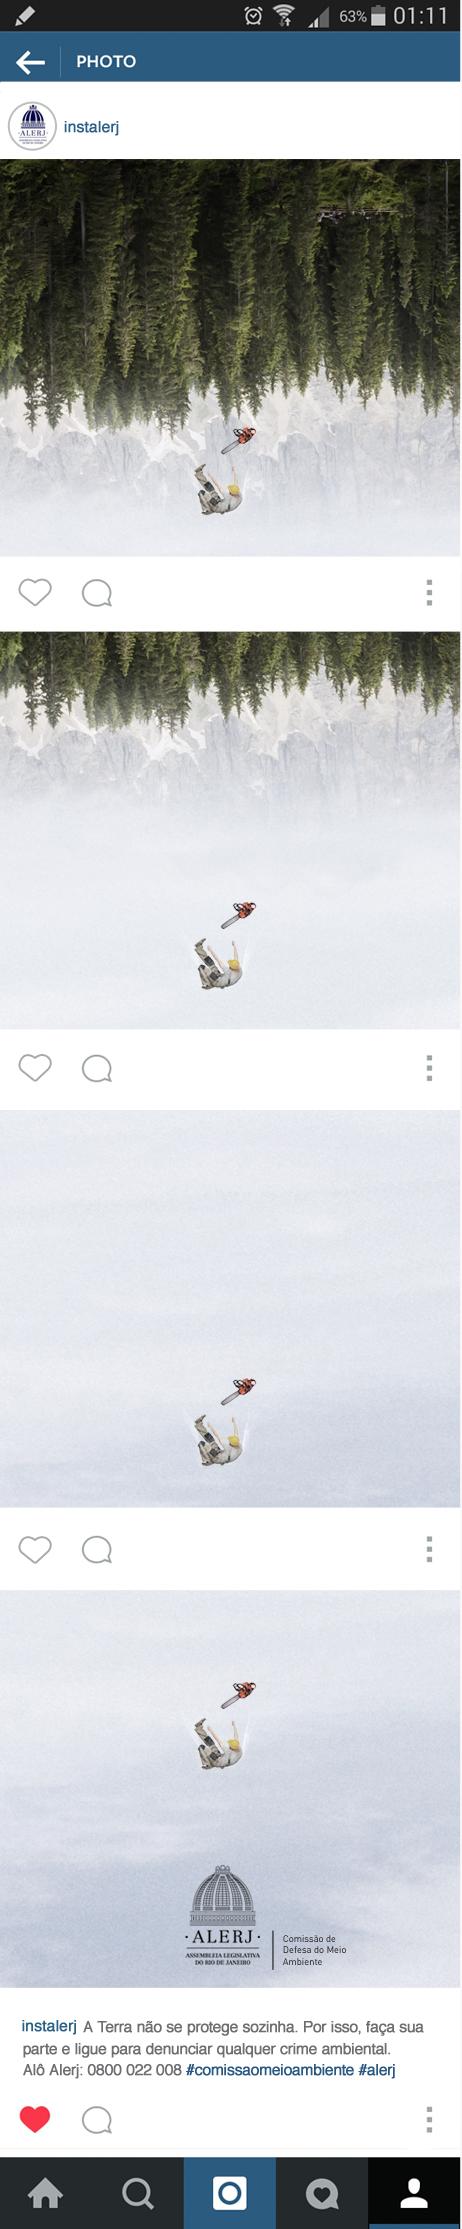 instagramflipbook